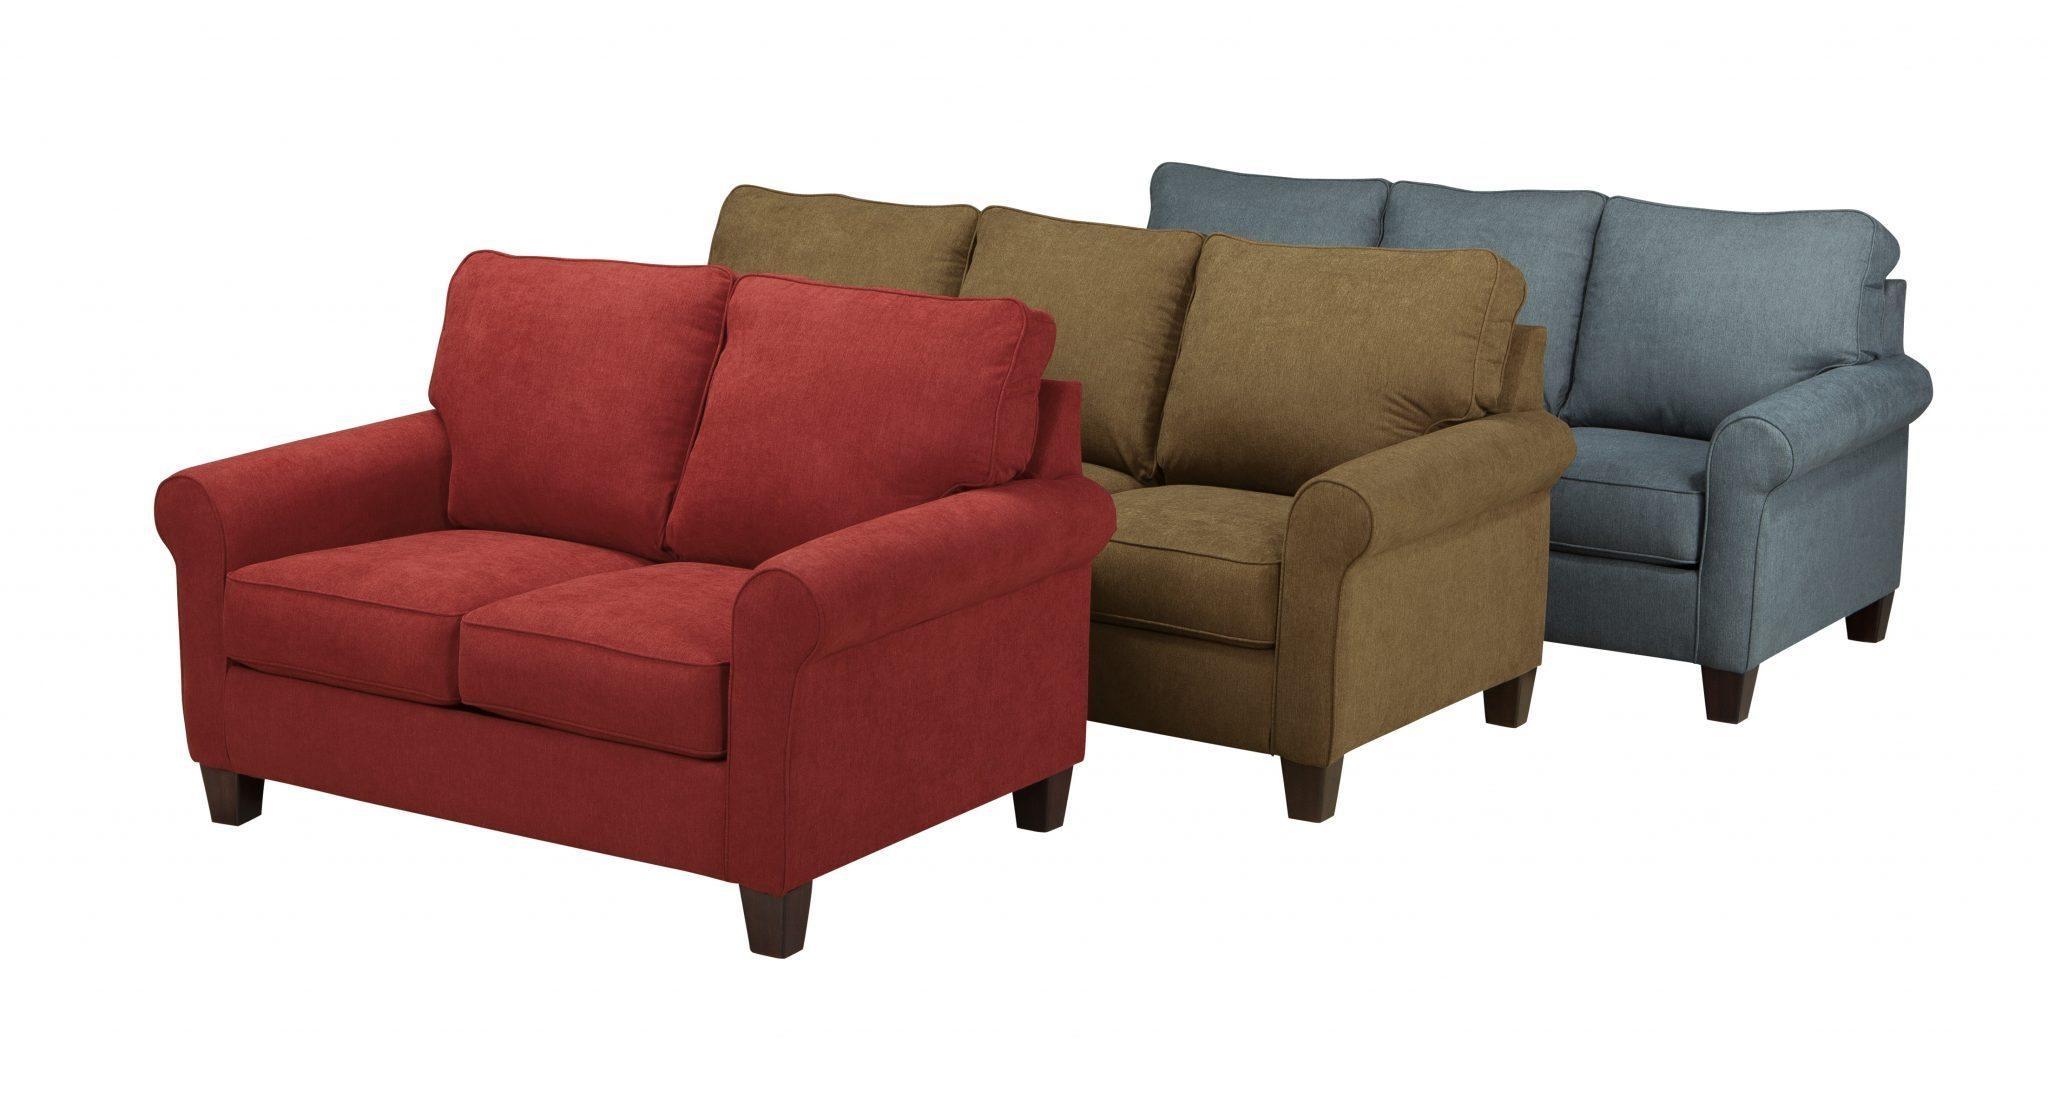 Sofas Center : Fascinating Ashley Sleeper Sofa Image Ideas intended for Chenille Sleeper Sofas